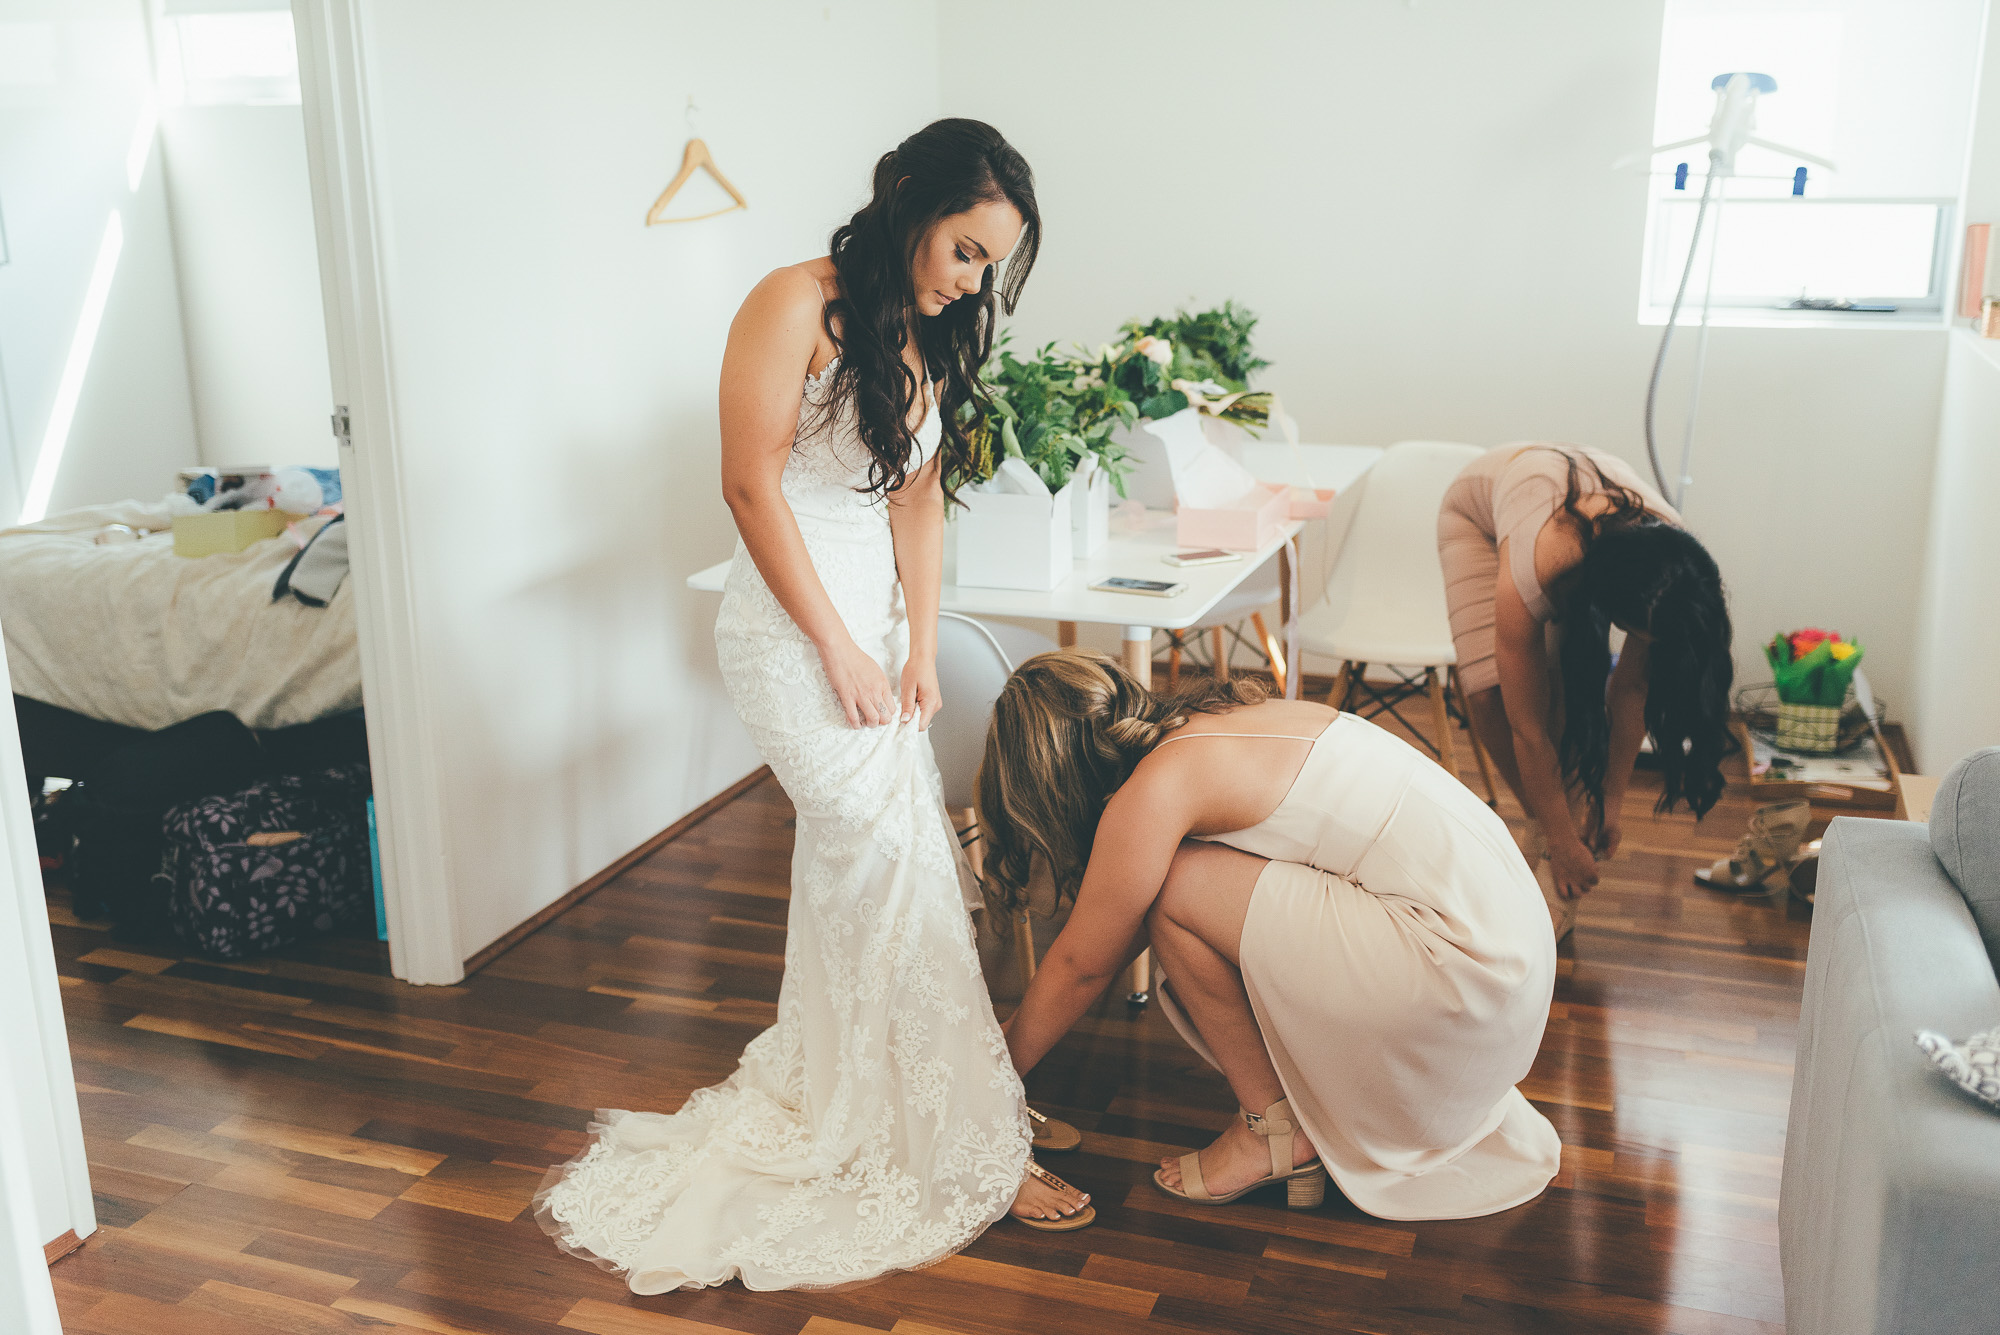 wedding-photographer-outdoor-casual-styled-los-angeles-australia-california-international-earthbound -19.jpg